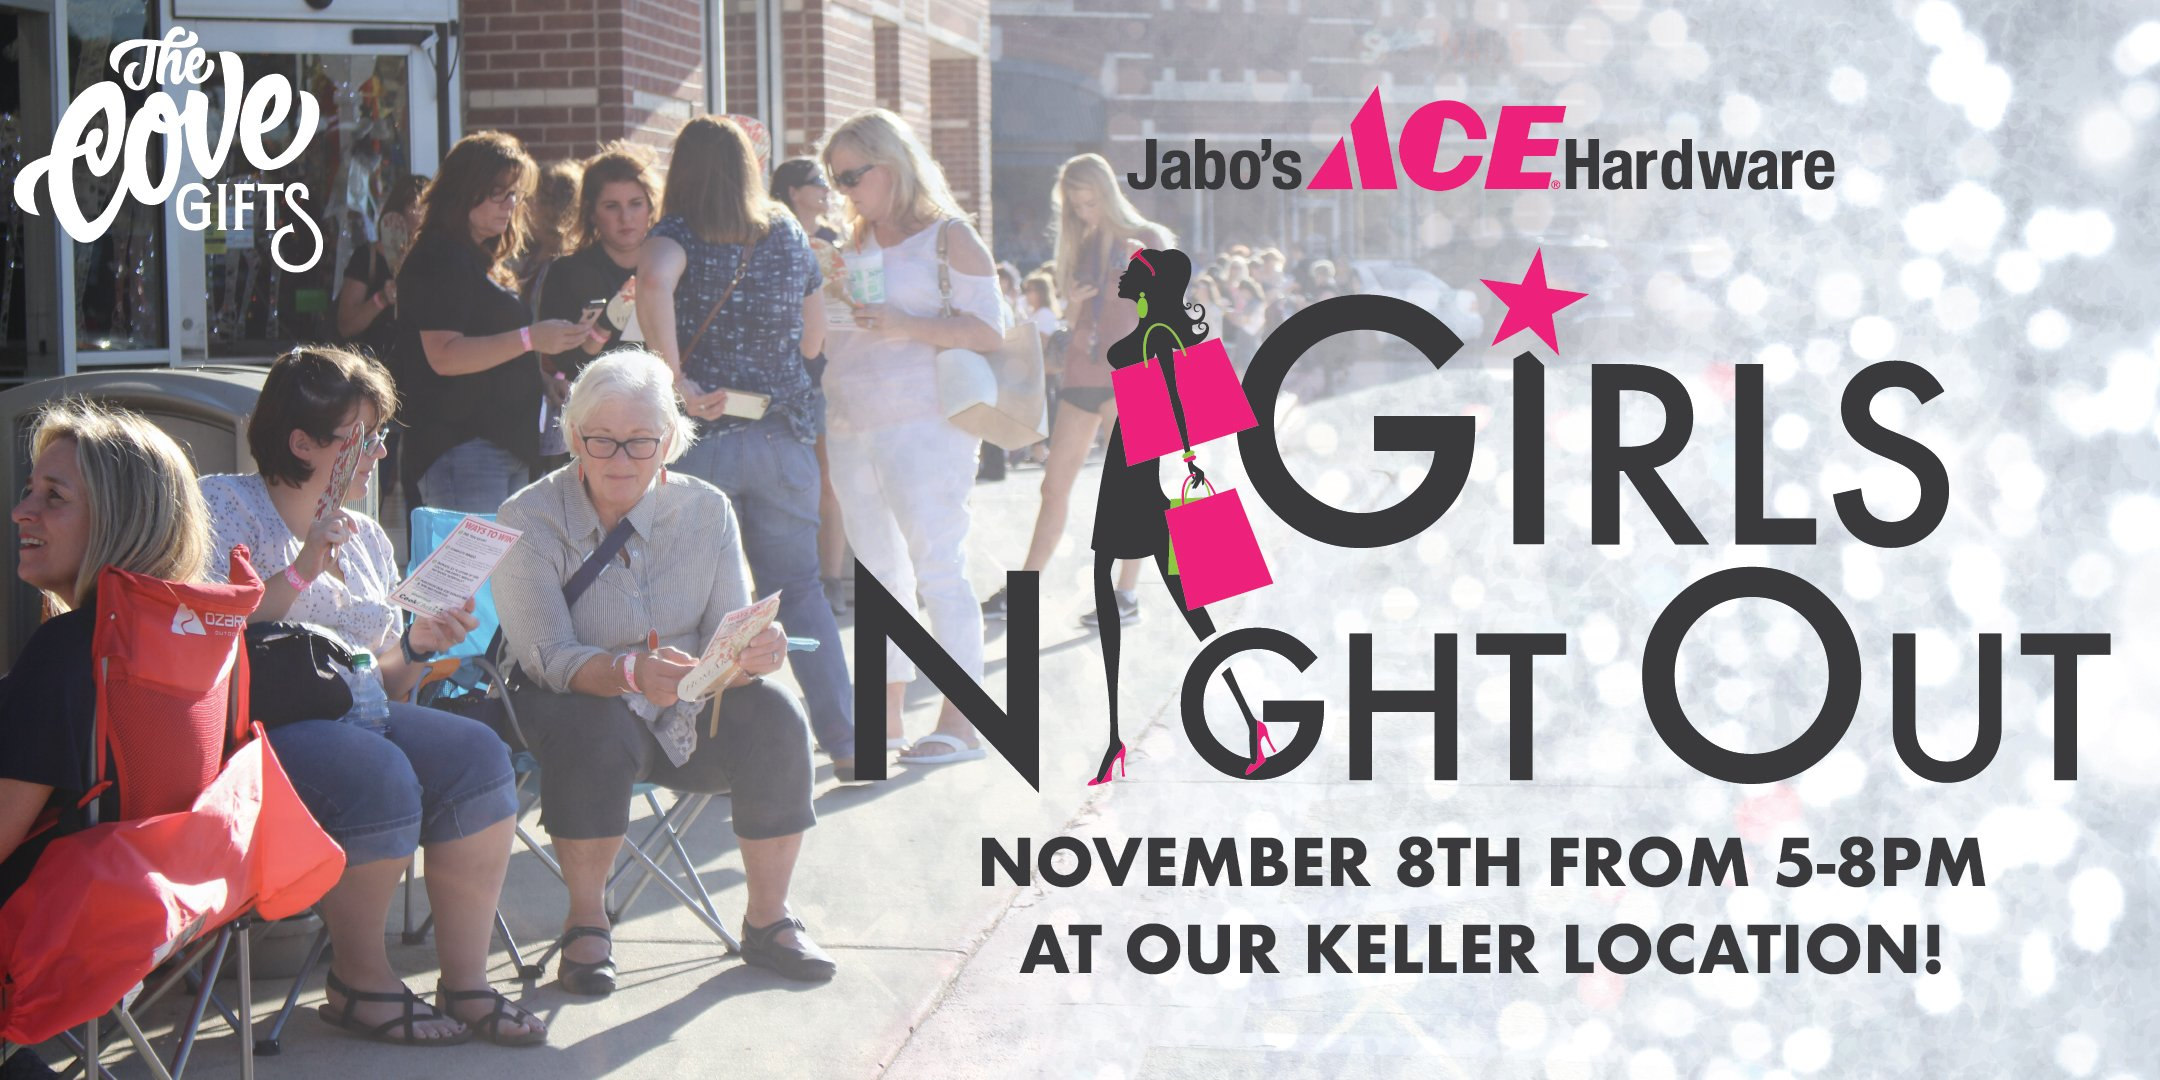 Keller Girls Night Out 2018 | Jabo\'s Ace Hardware